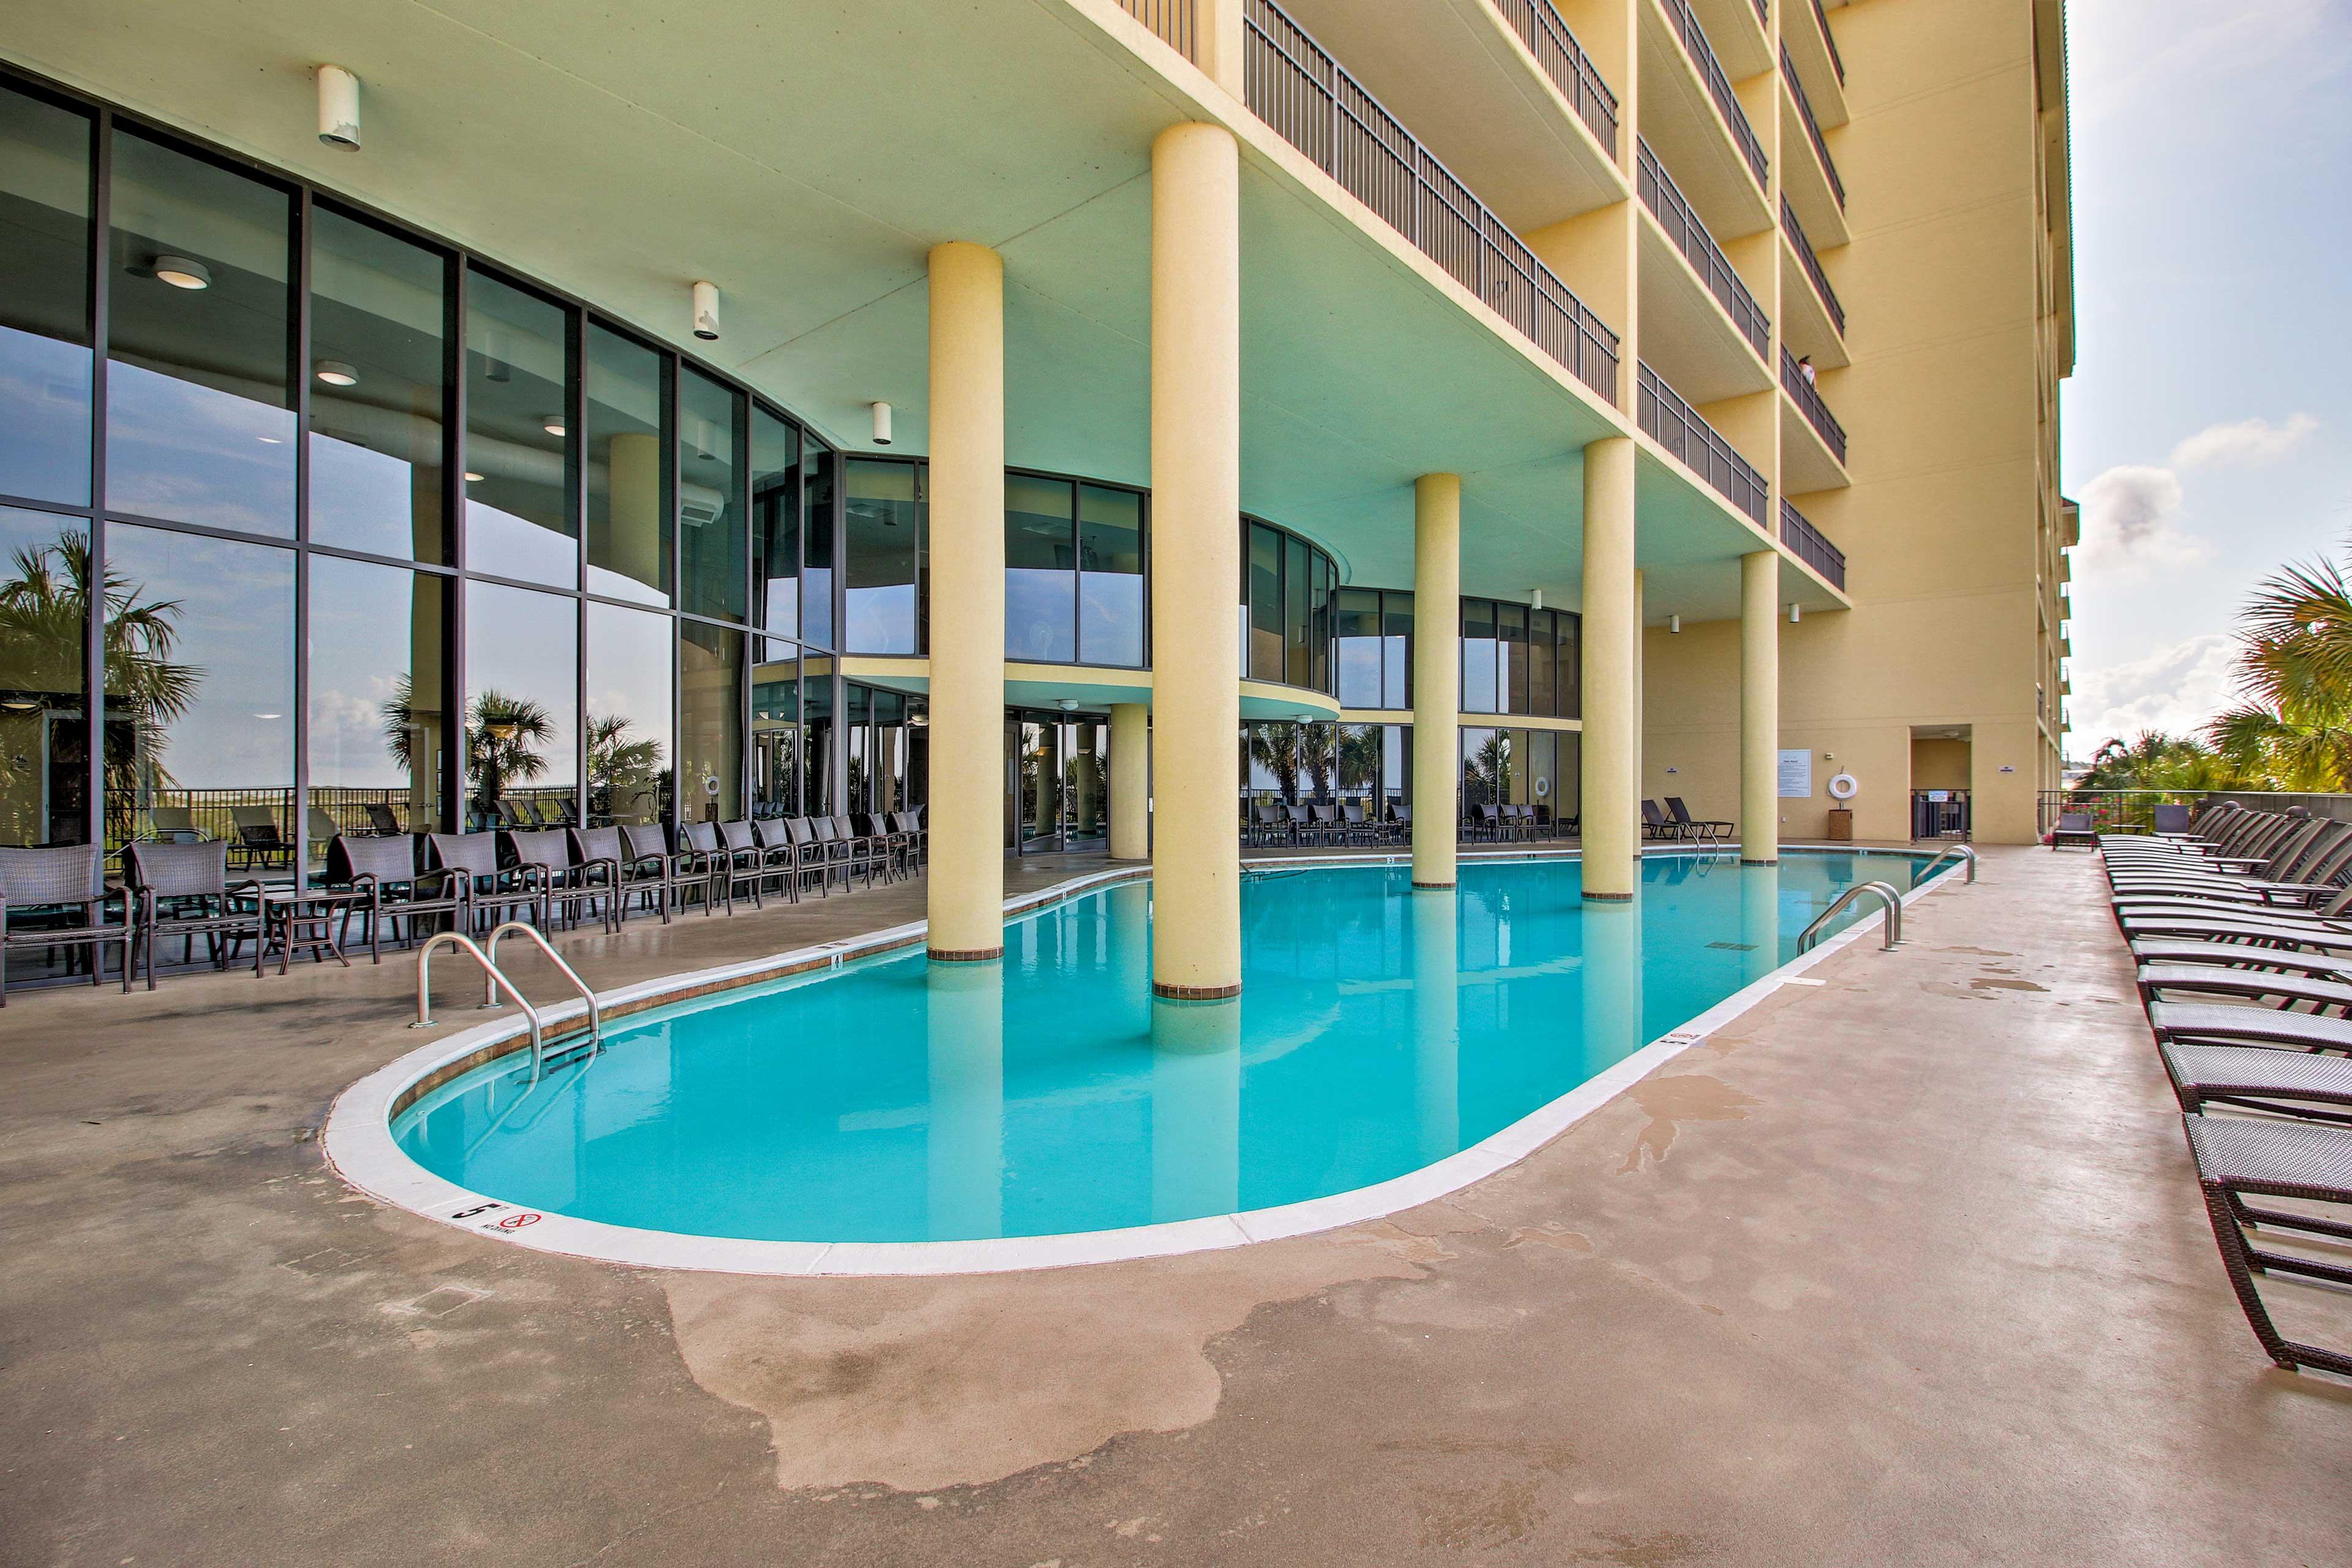 Beat the Alabama heat by splashing around in the pool.